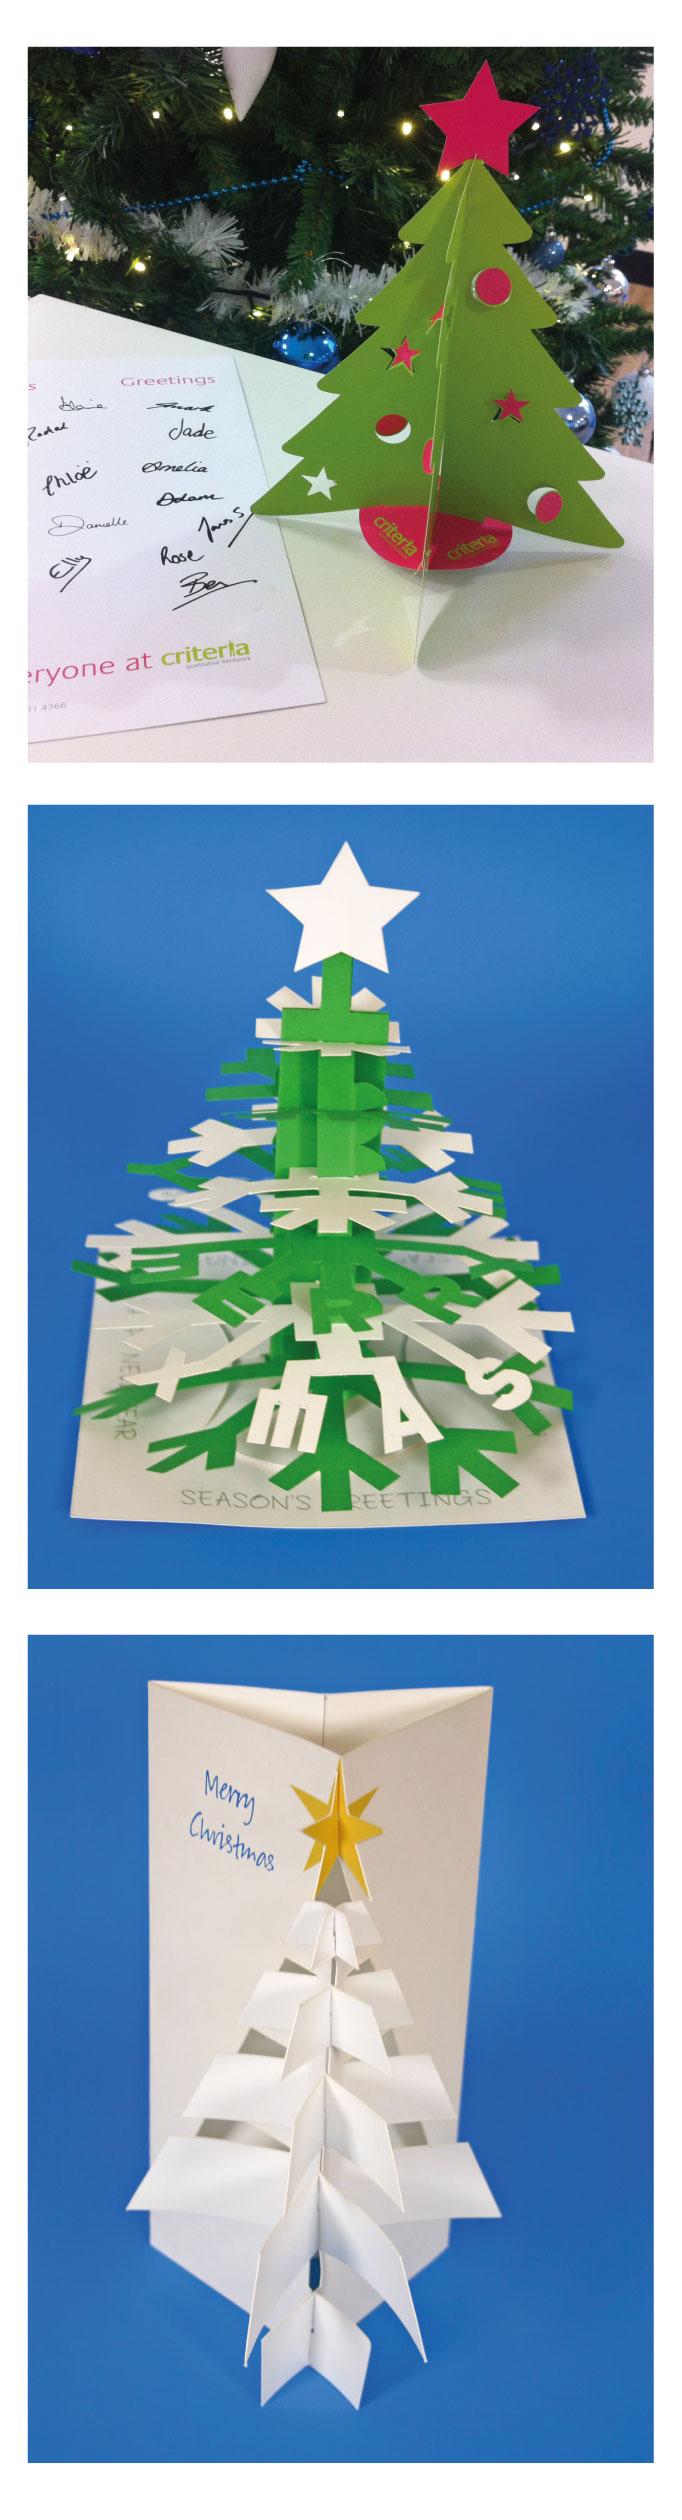 i selection of pop up christmas trees i created